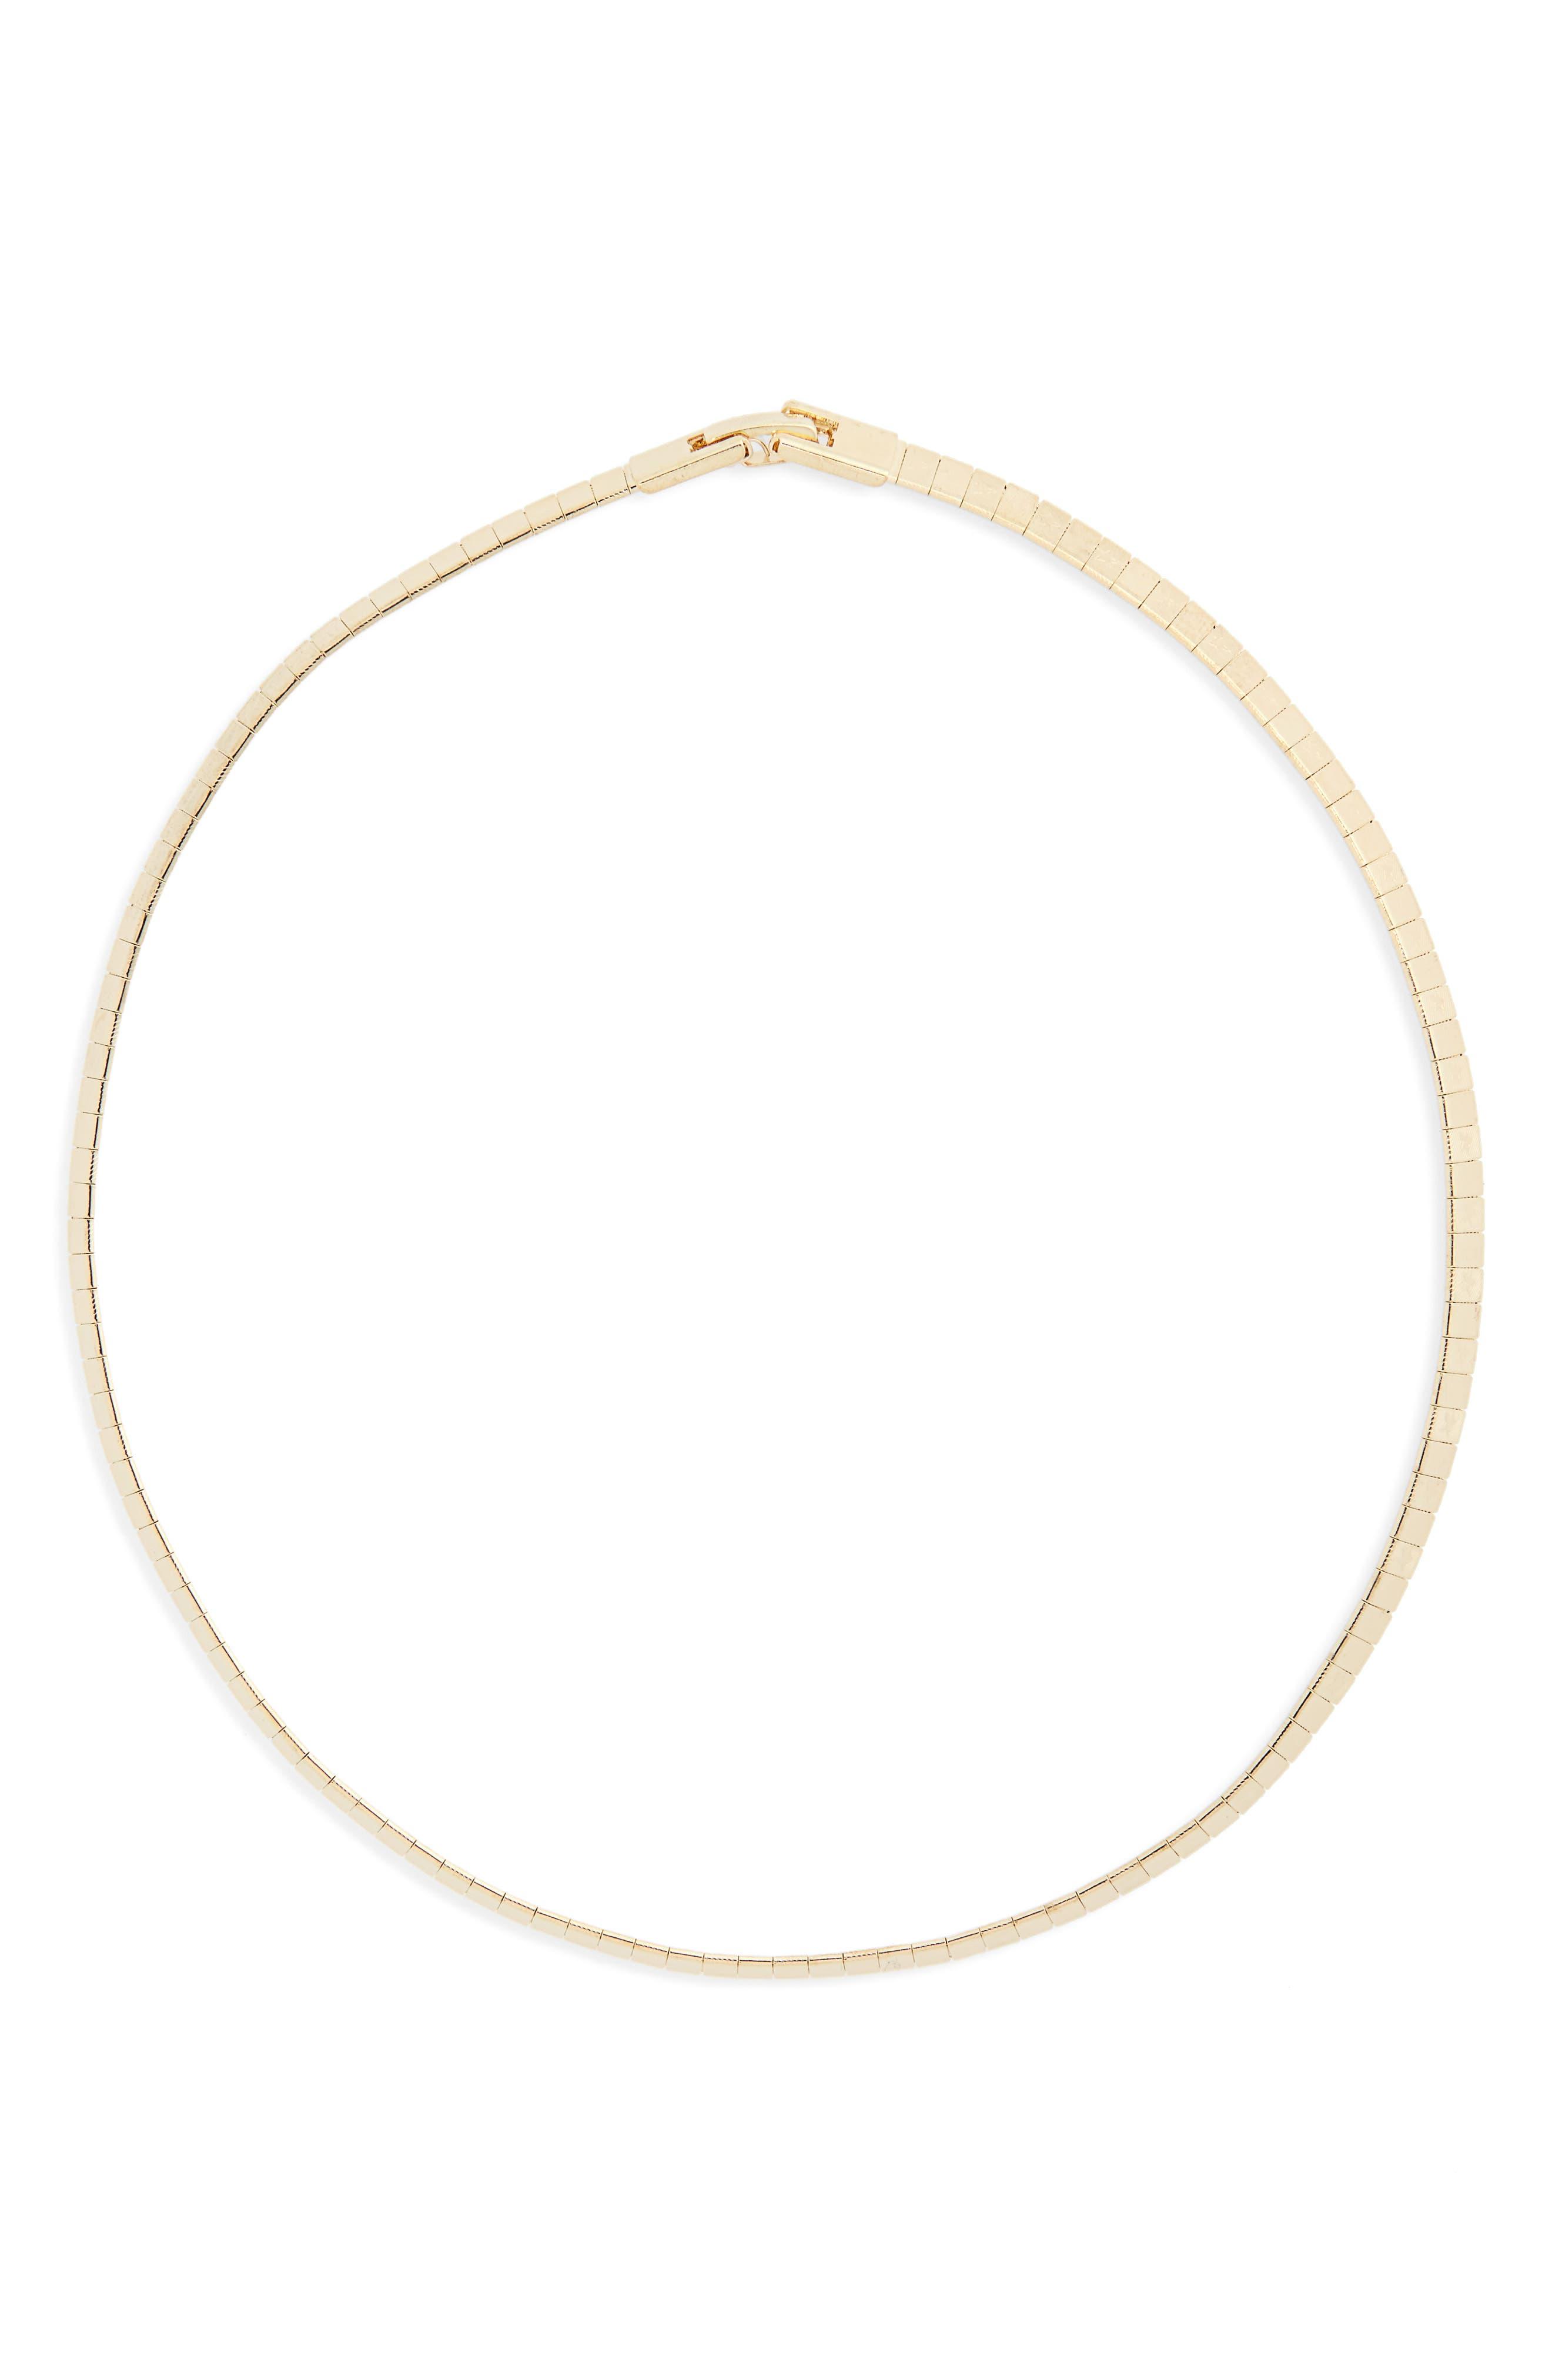 Thin Collar Necklace,                             Main thumbnail 1, color,                             710